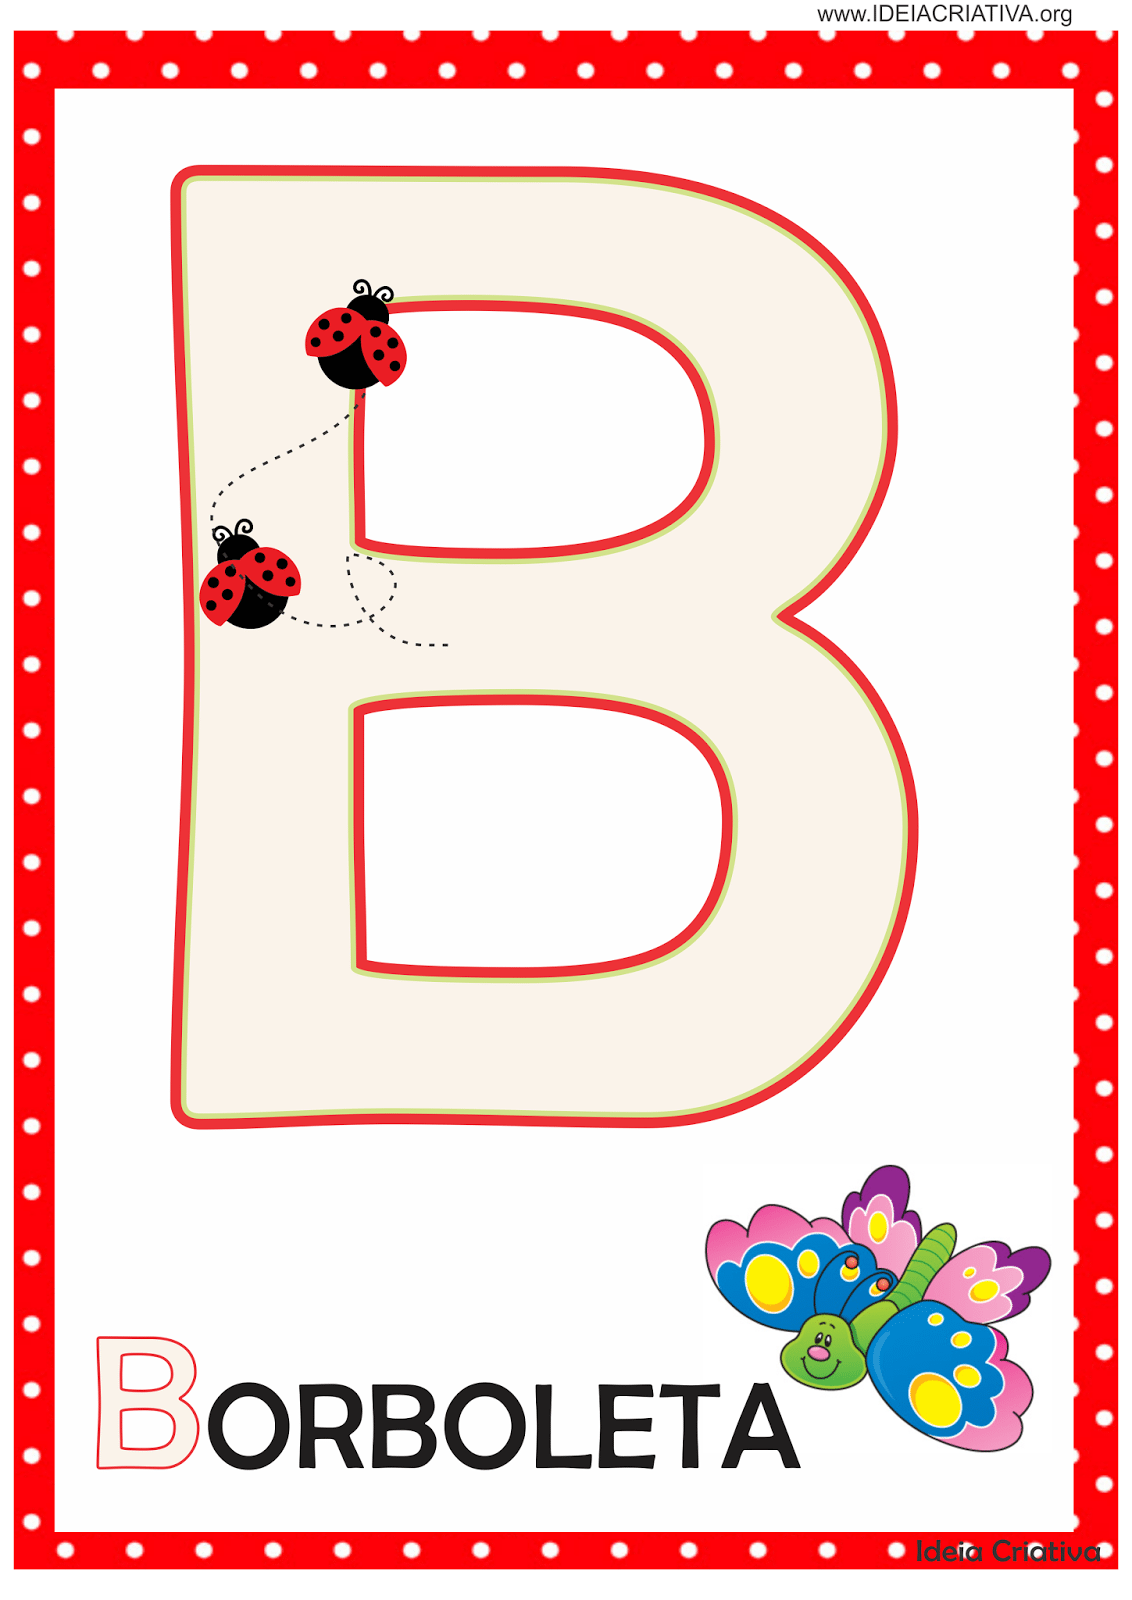 Alfabeto Infantil Ilustrado Para Imprimir -> Desenhos Para Alfabeto Ilustrado